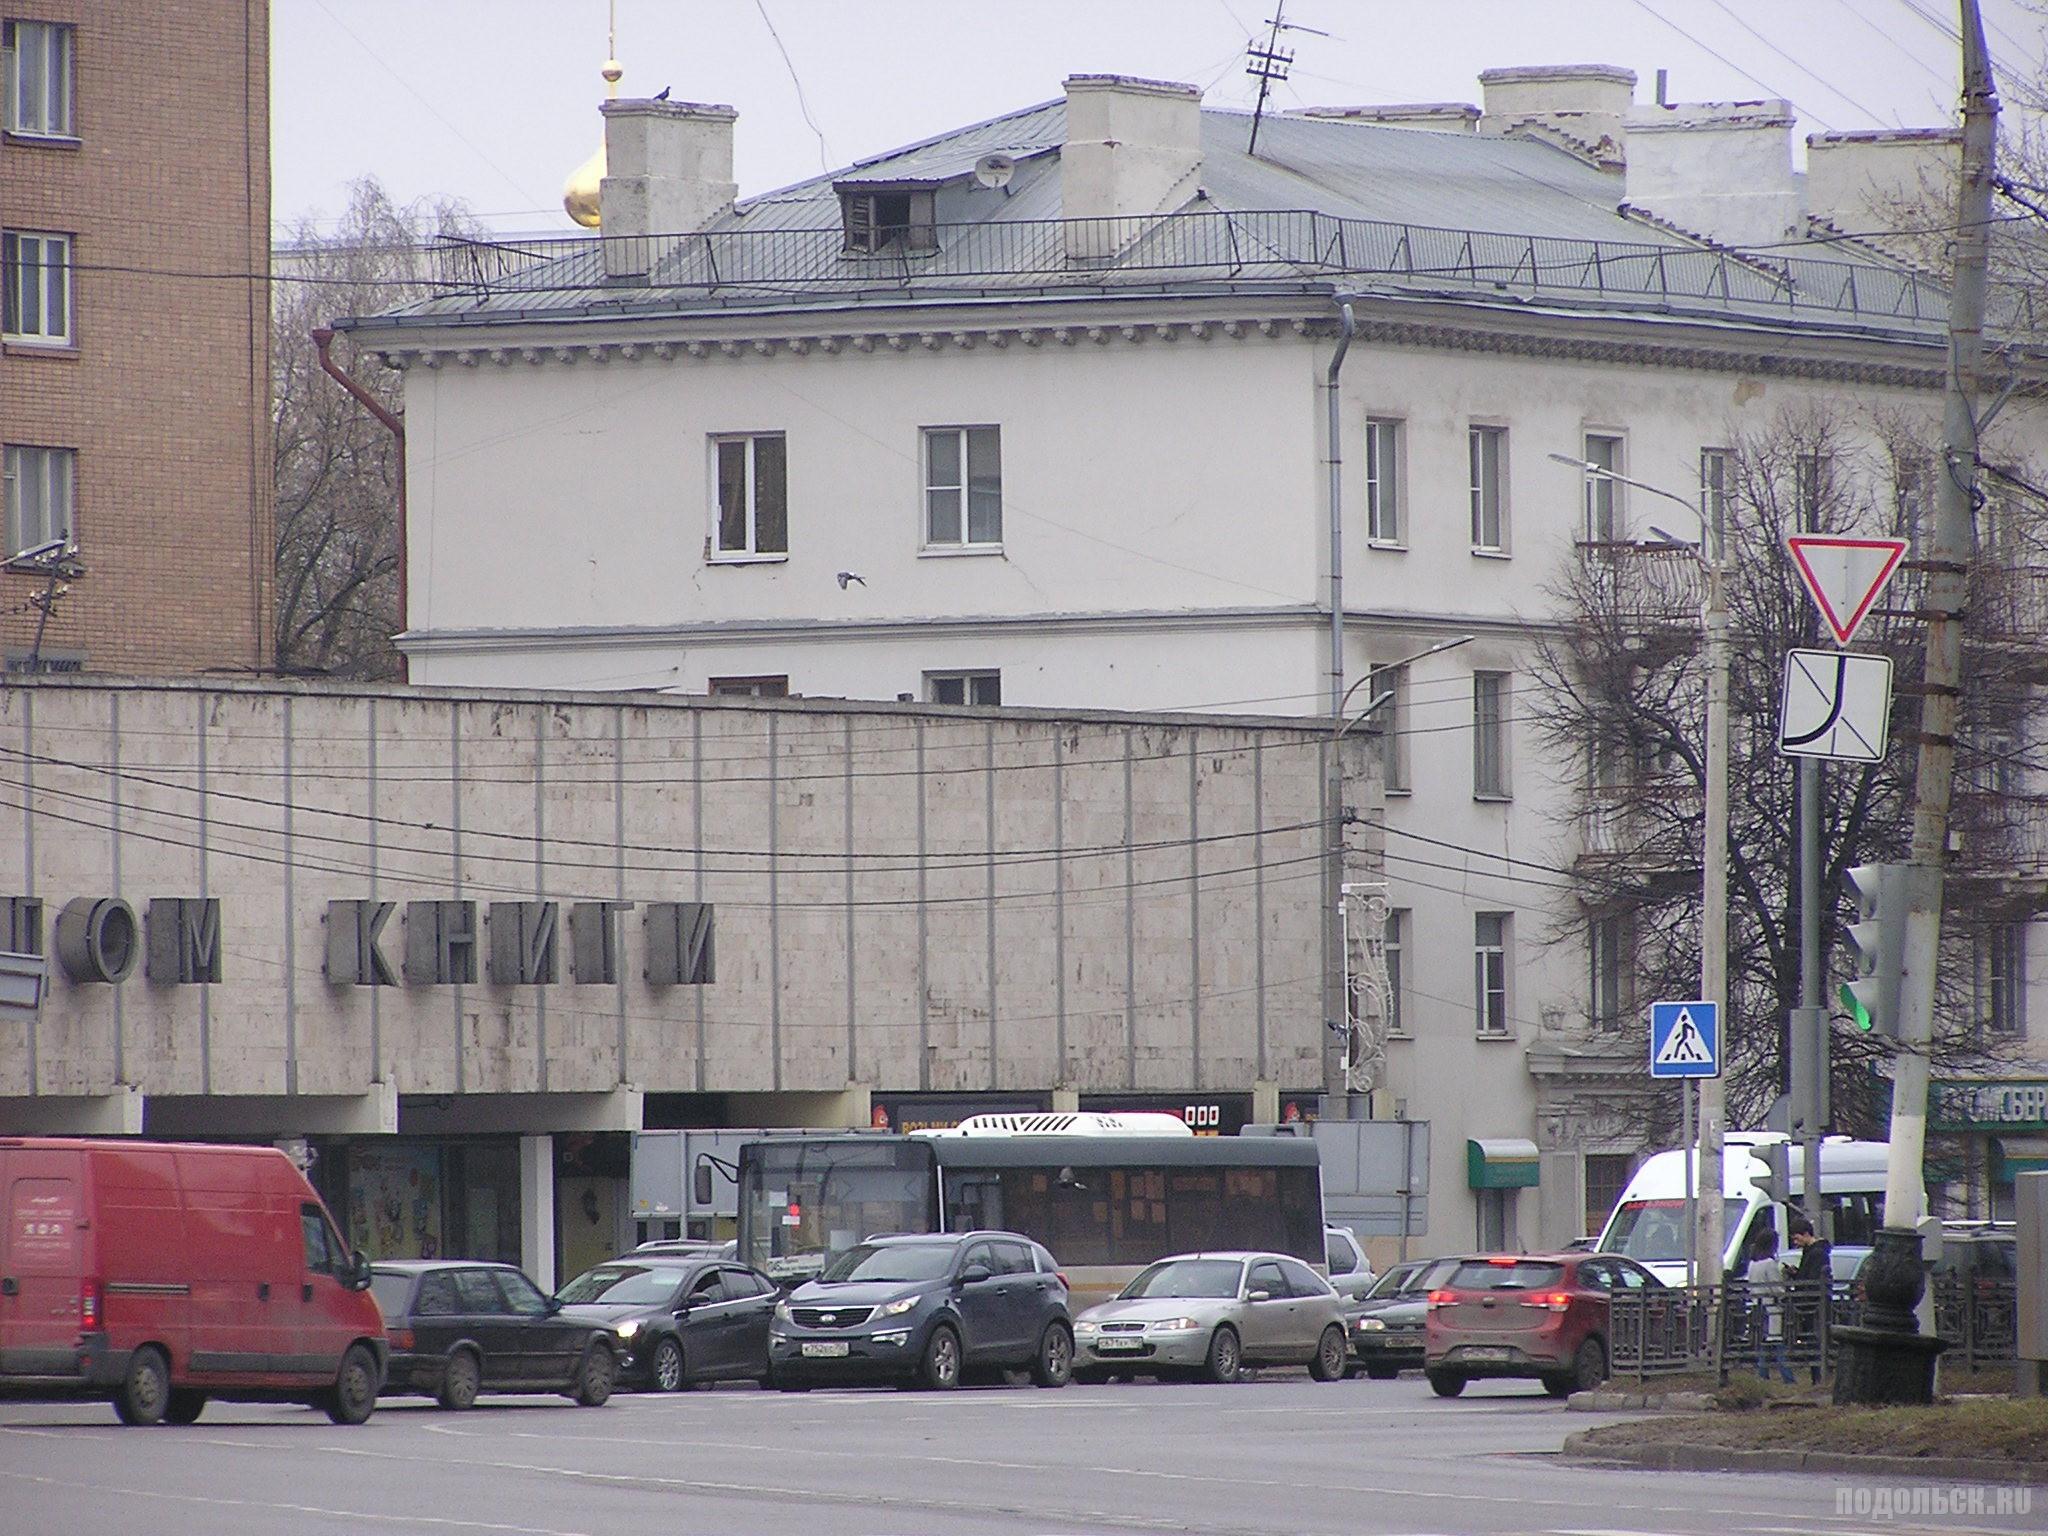 Проспект Ленина на площади. 2 апреля 2017.